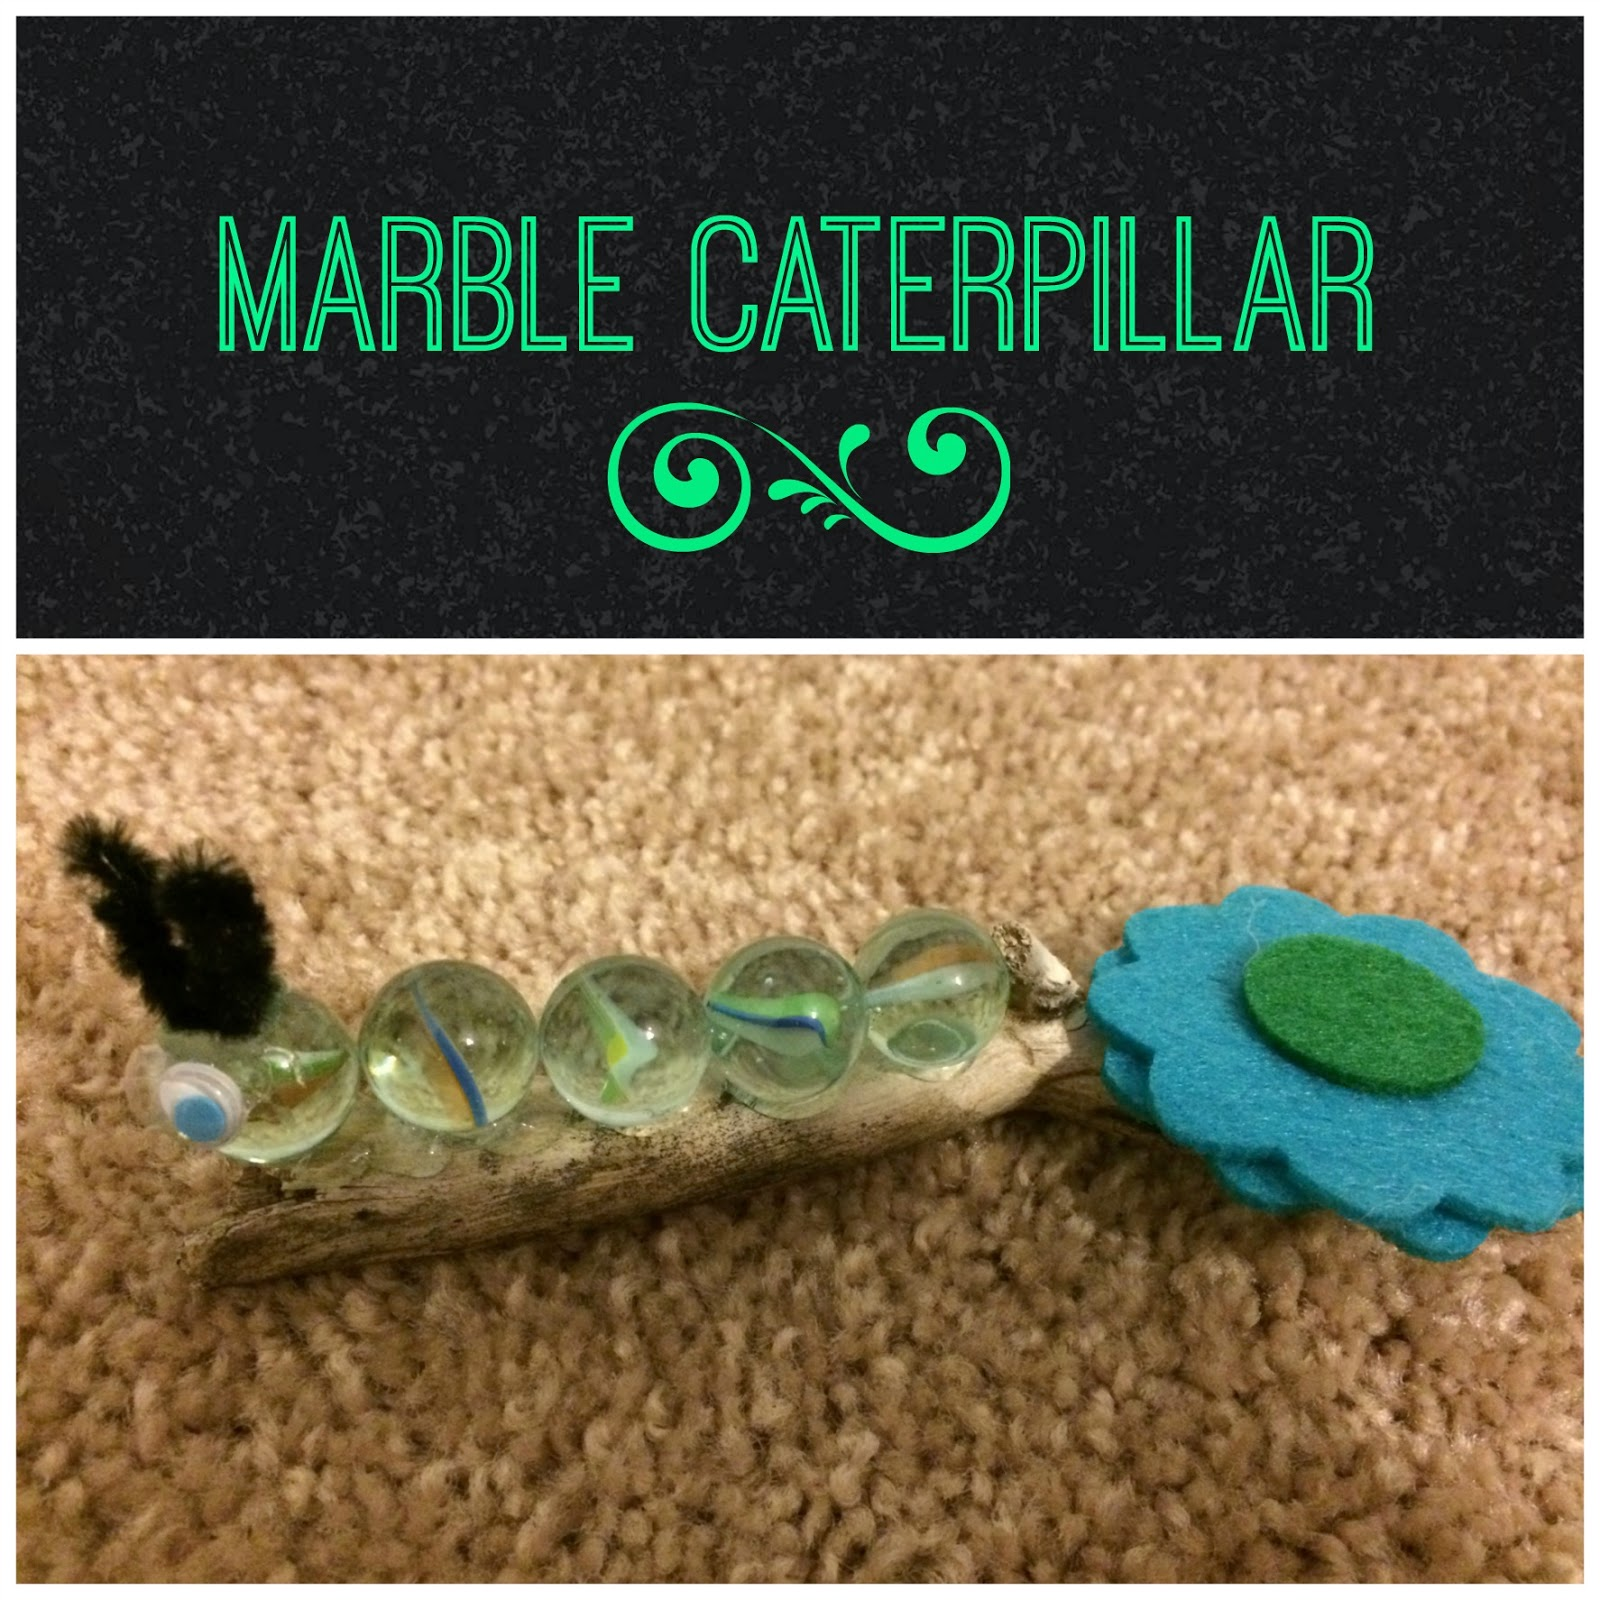 DIY Marble Caterpillar Craft for Kids